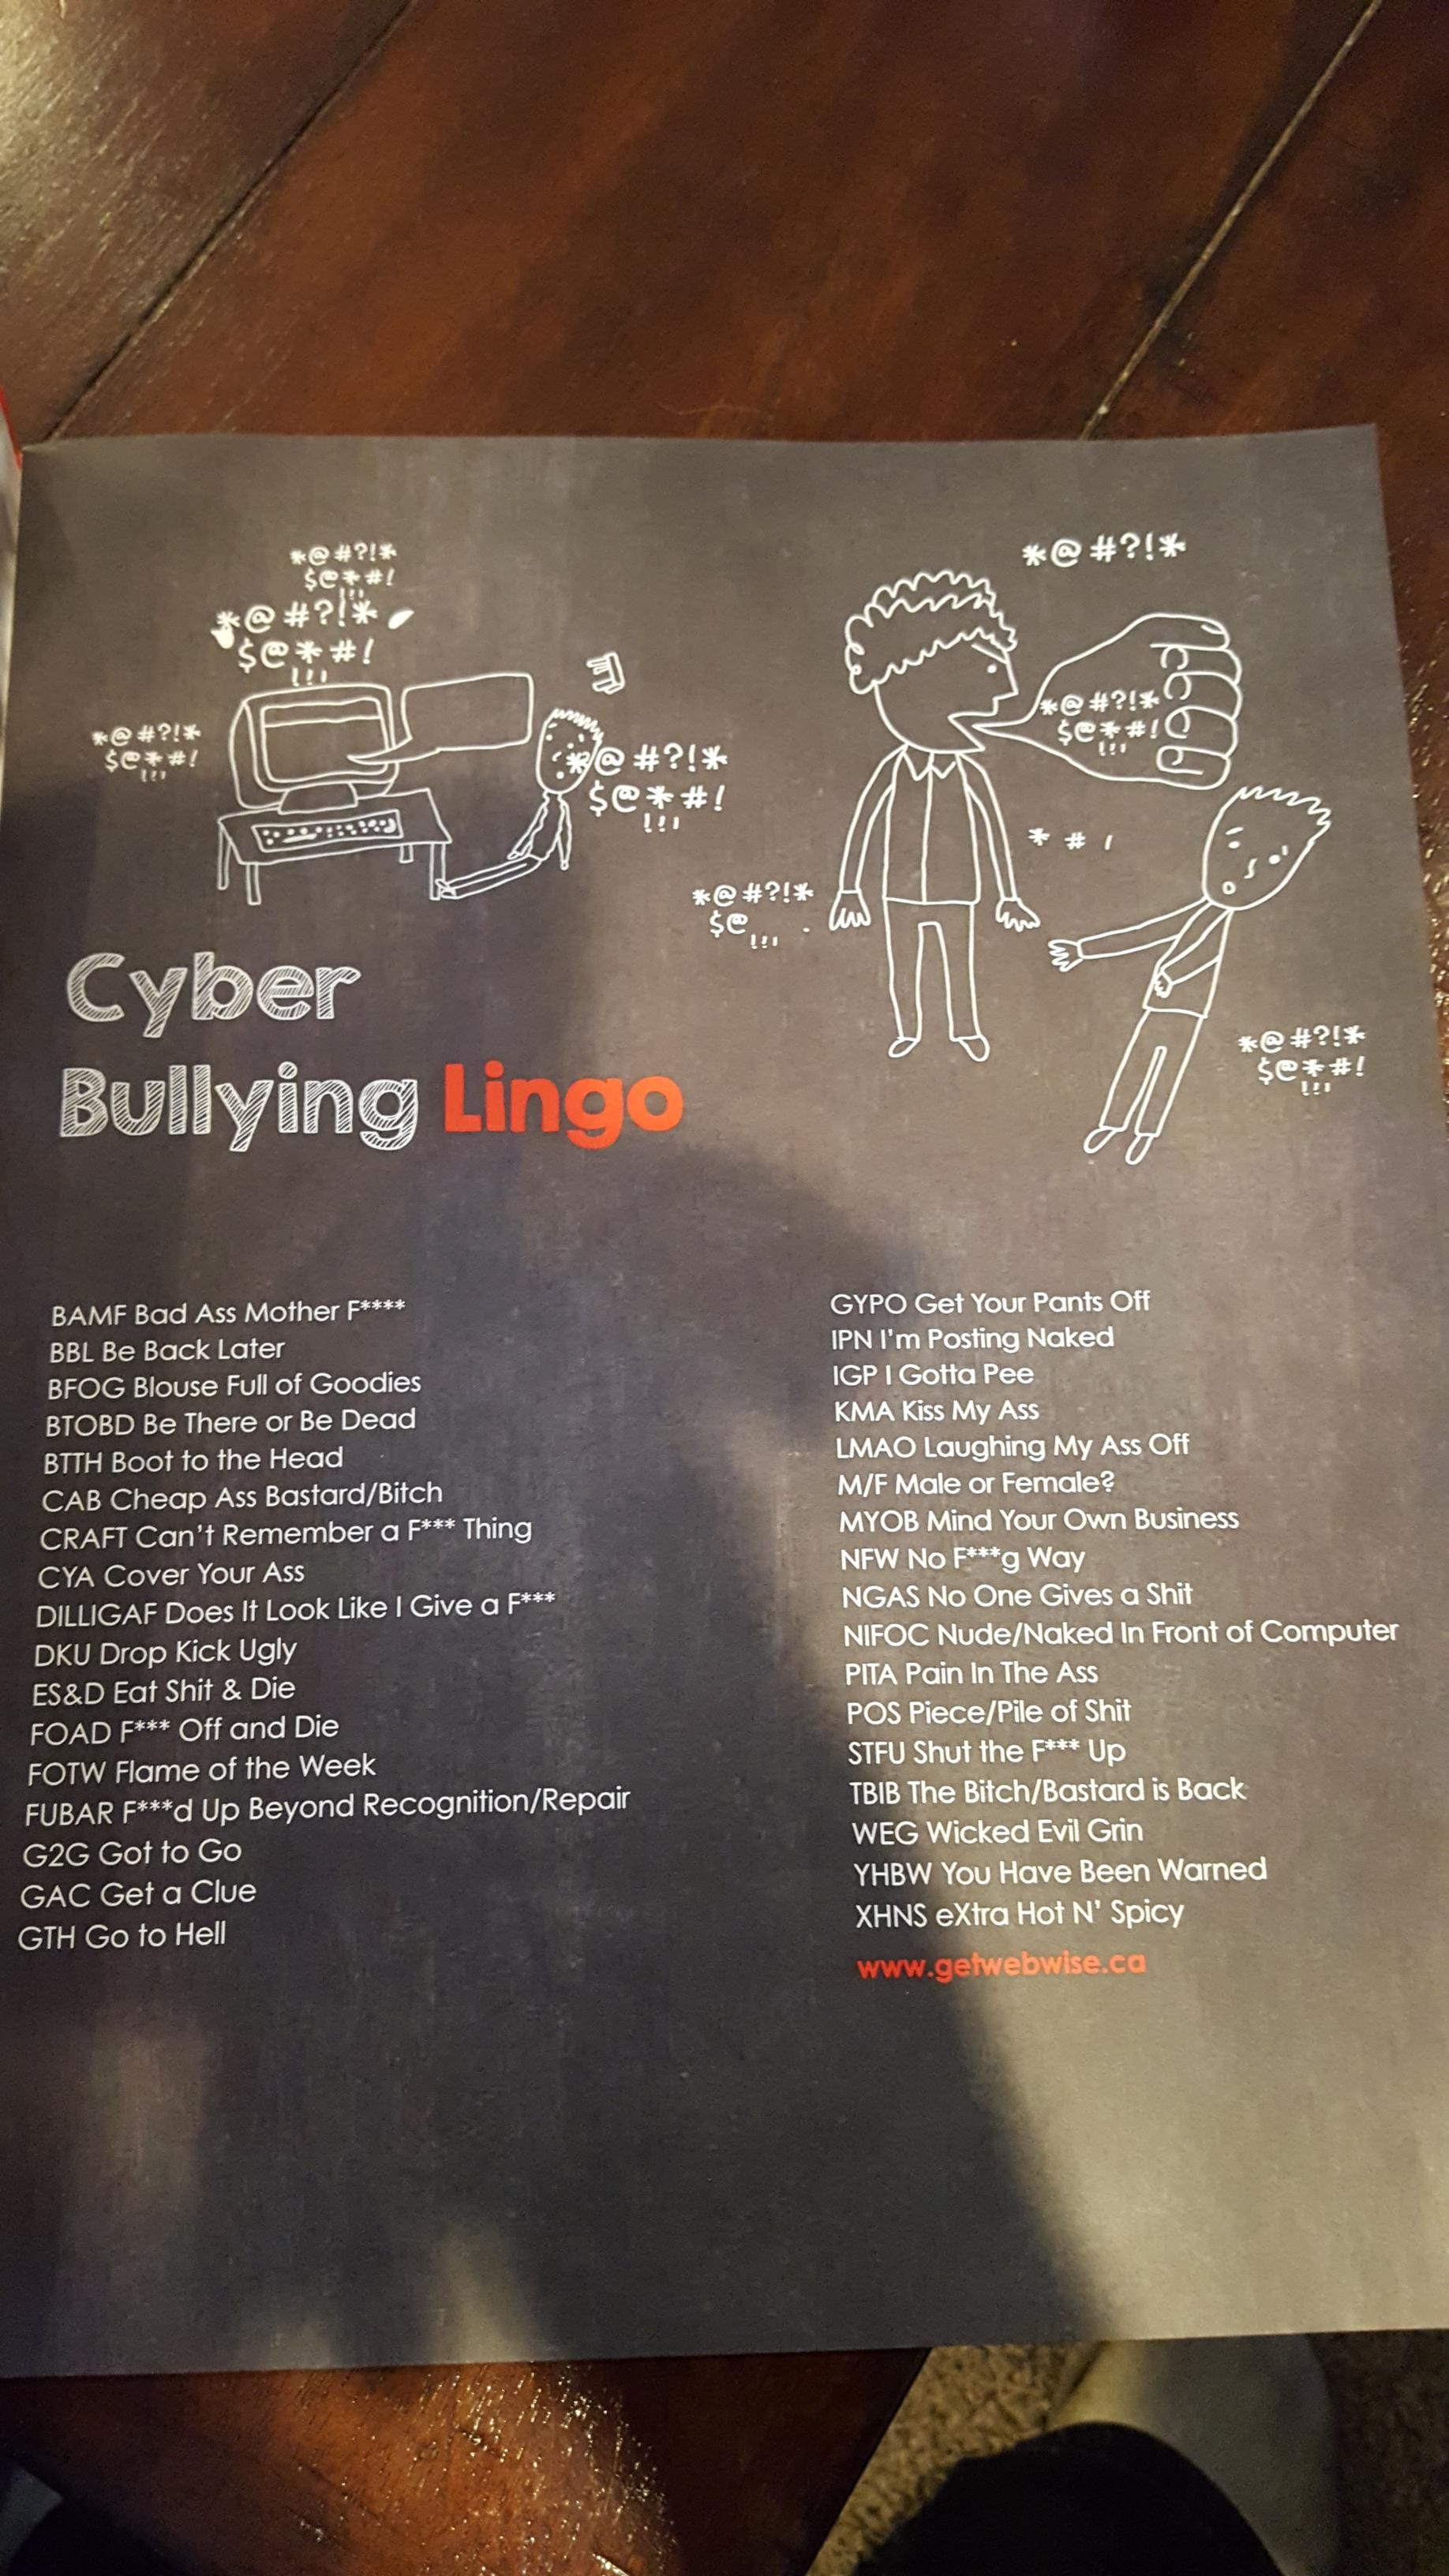 medium resolution of cyber bullying lingo my nephew brought home